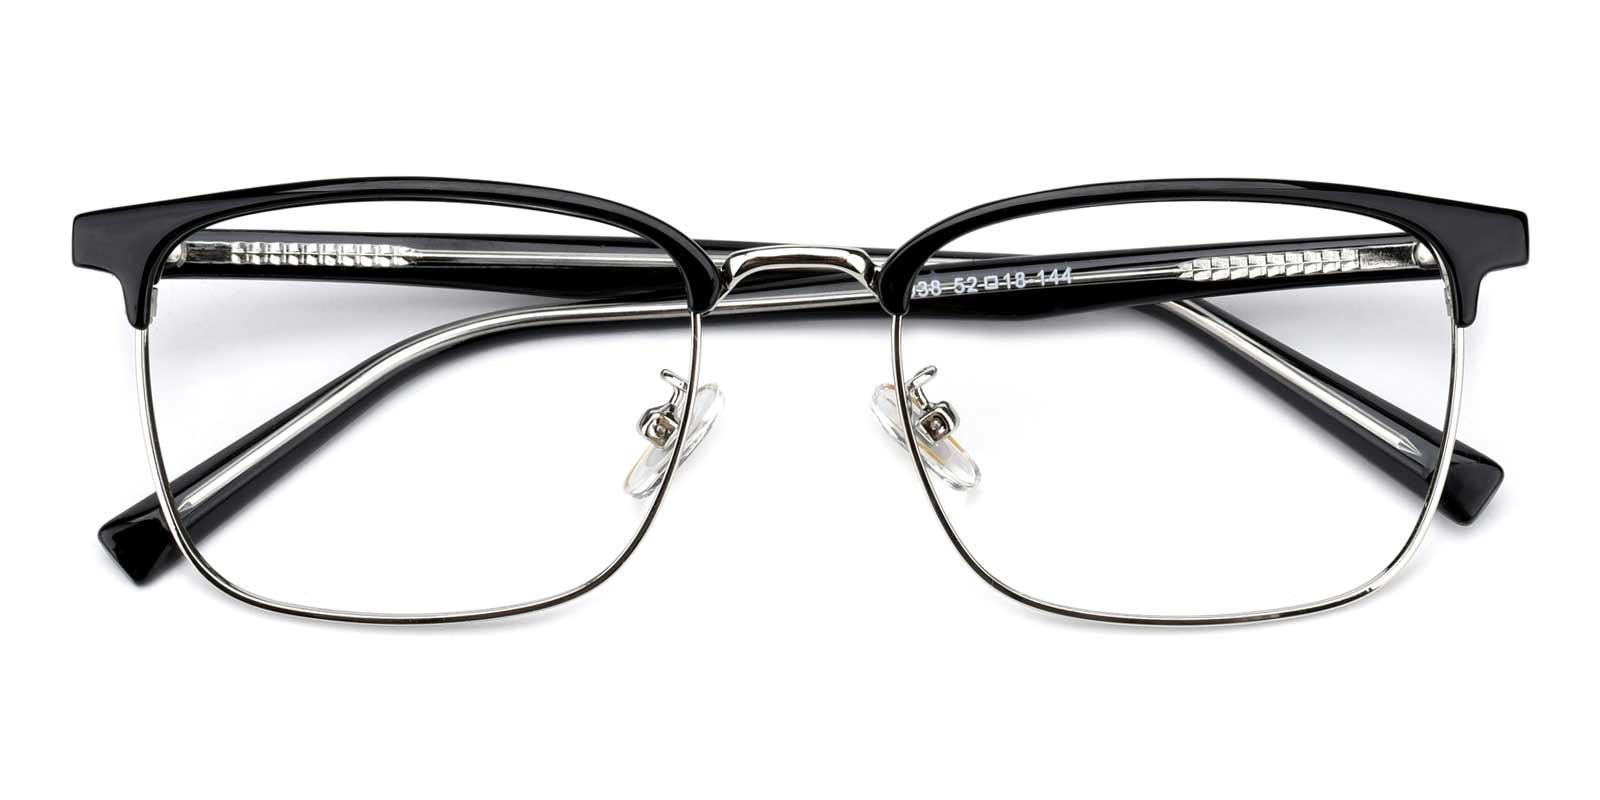 Active-Silver-Browline-TR-Eyeglasses-detail